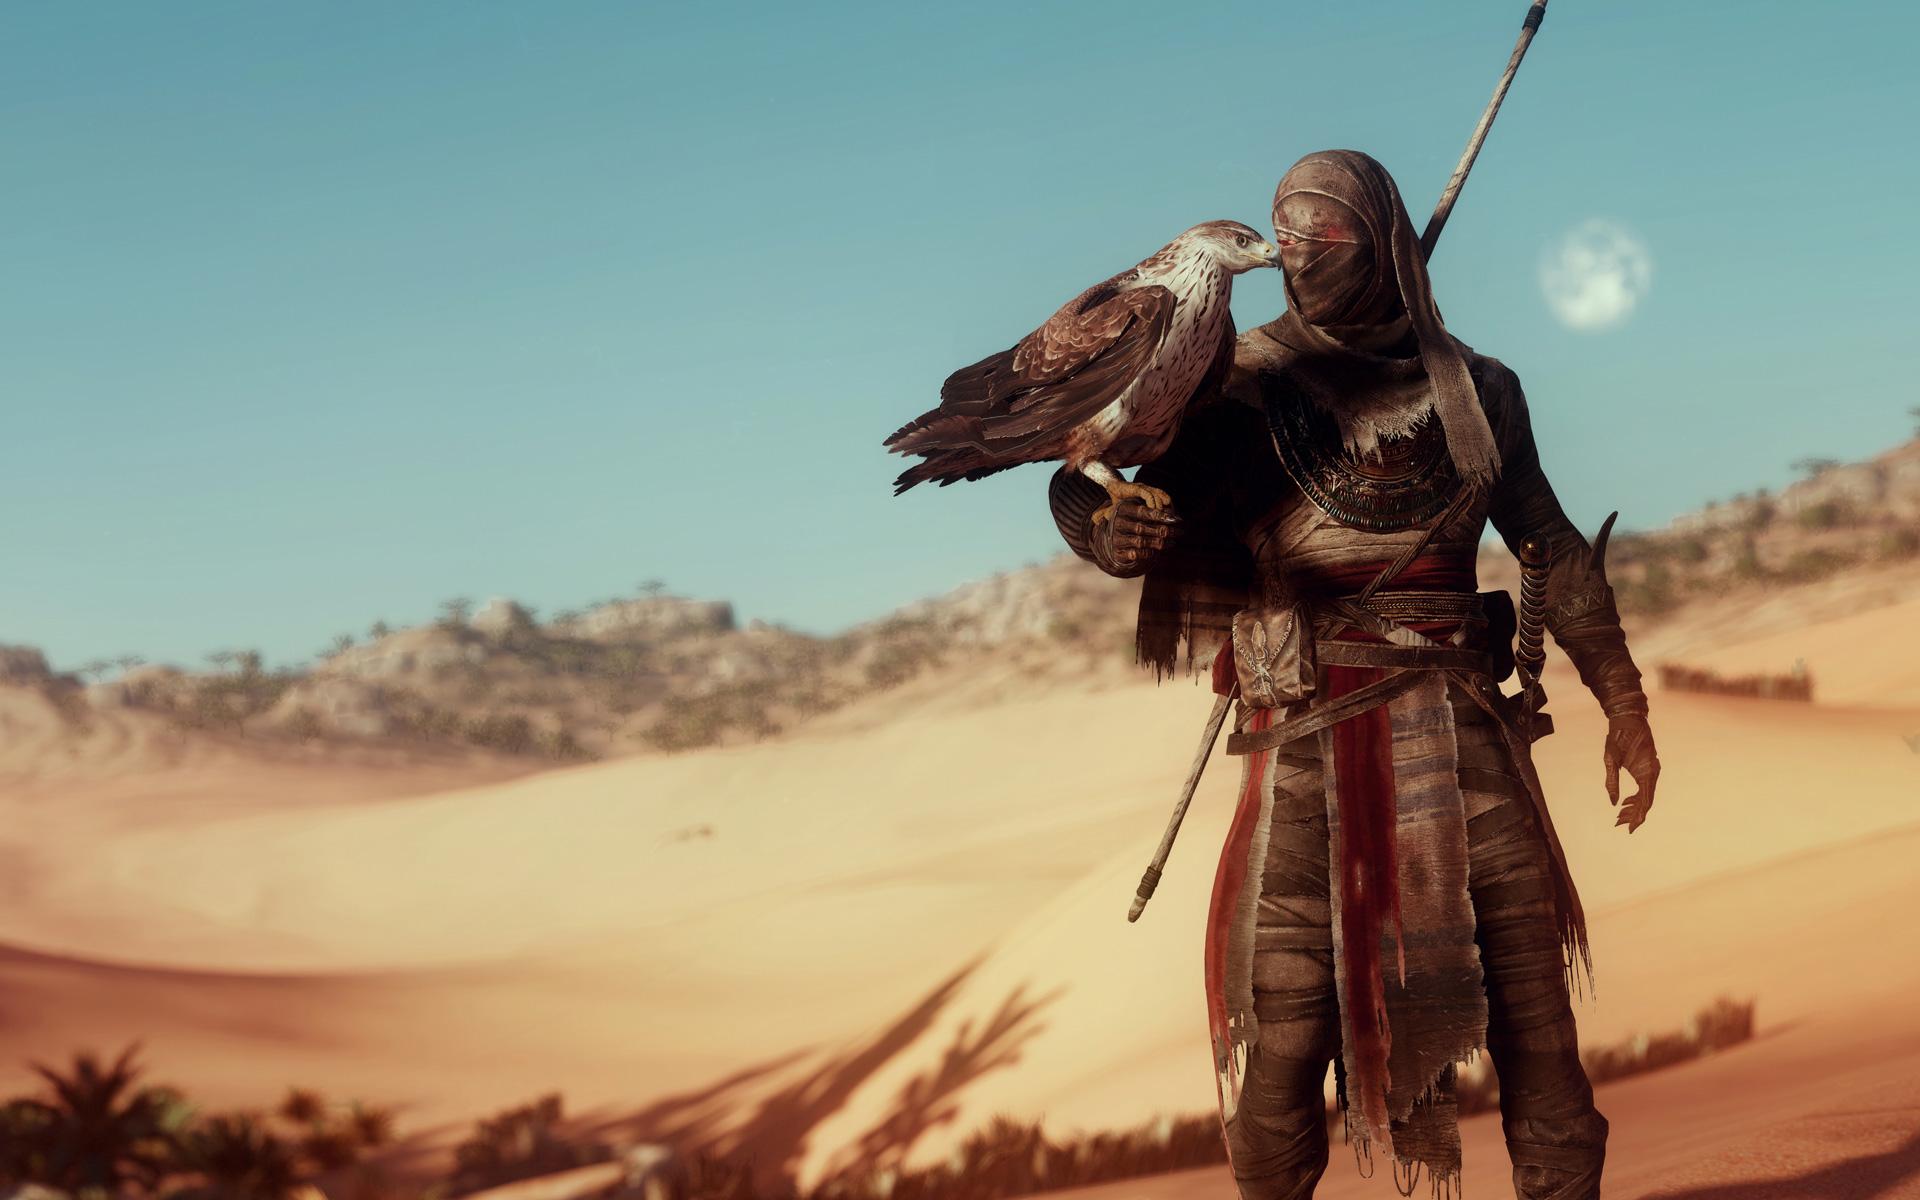 Free Assassin's Creed Origins Wallpaper in 1920x1200